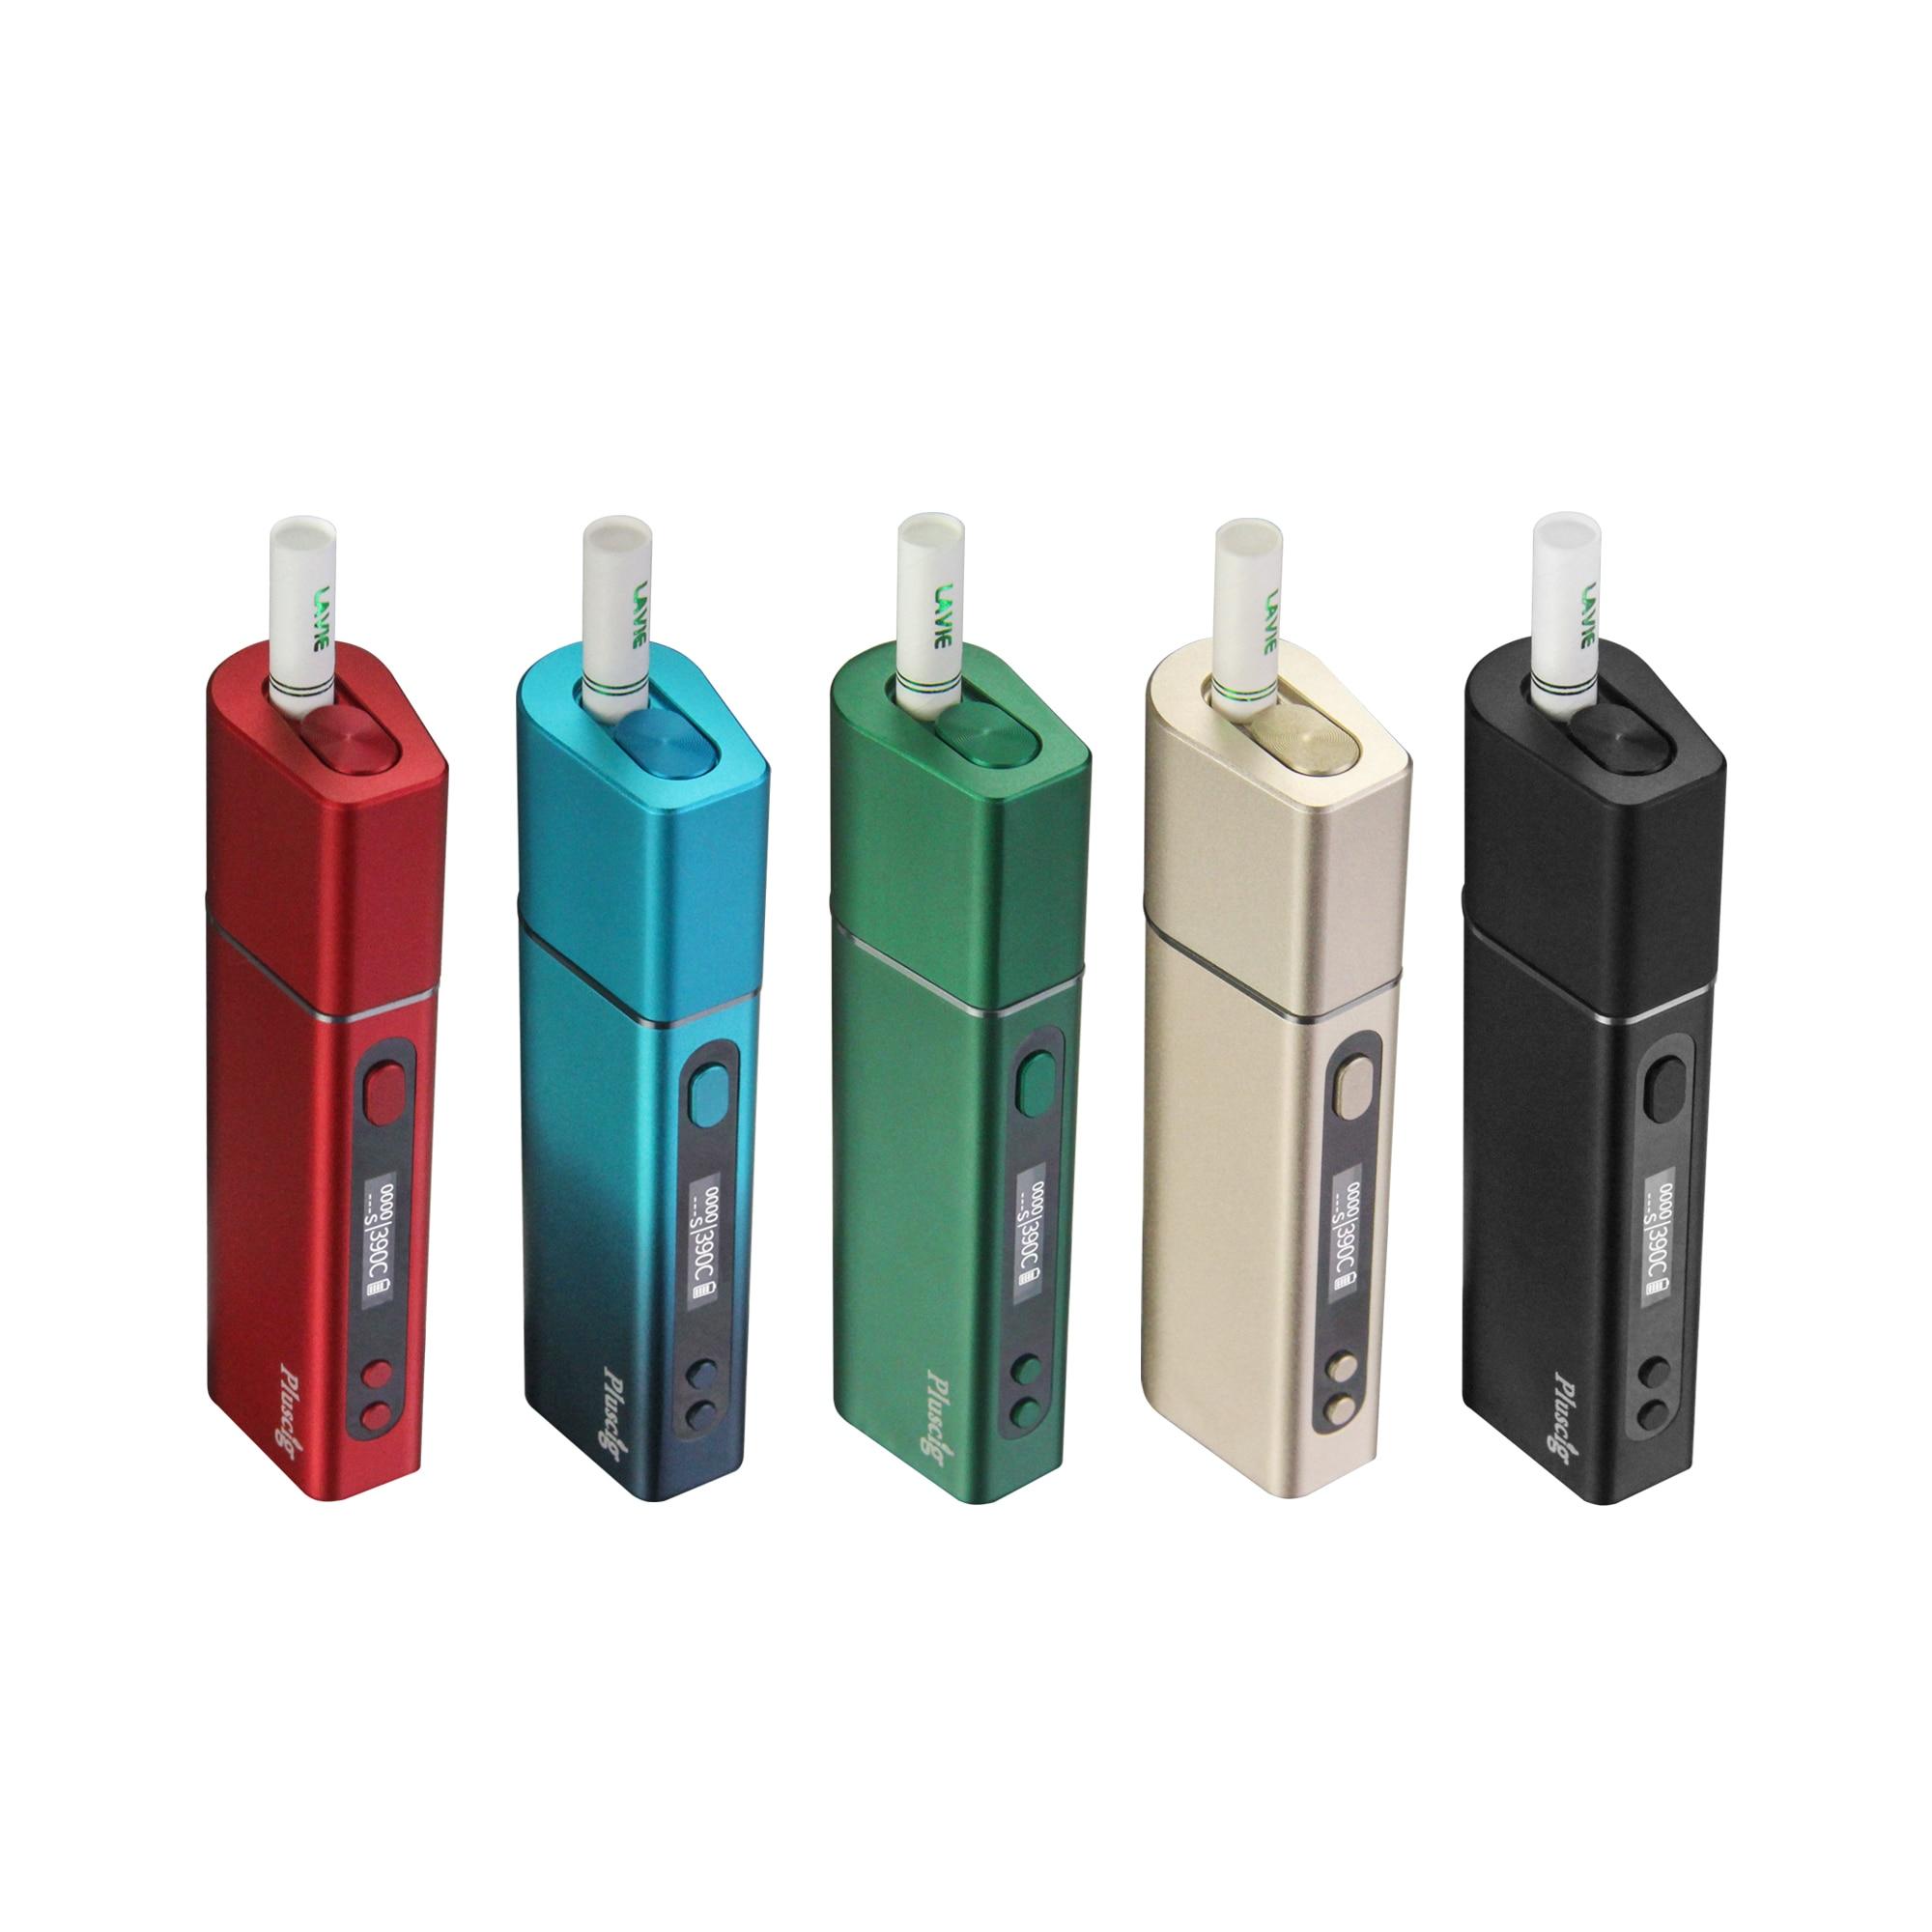 Original Pluscig S9 Charged Electronic Cigarette Vape Kits with 3500mah Battery Brand Heating Tobacco Stick E-cigarette kit